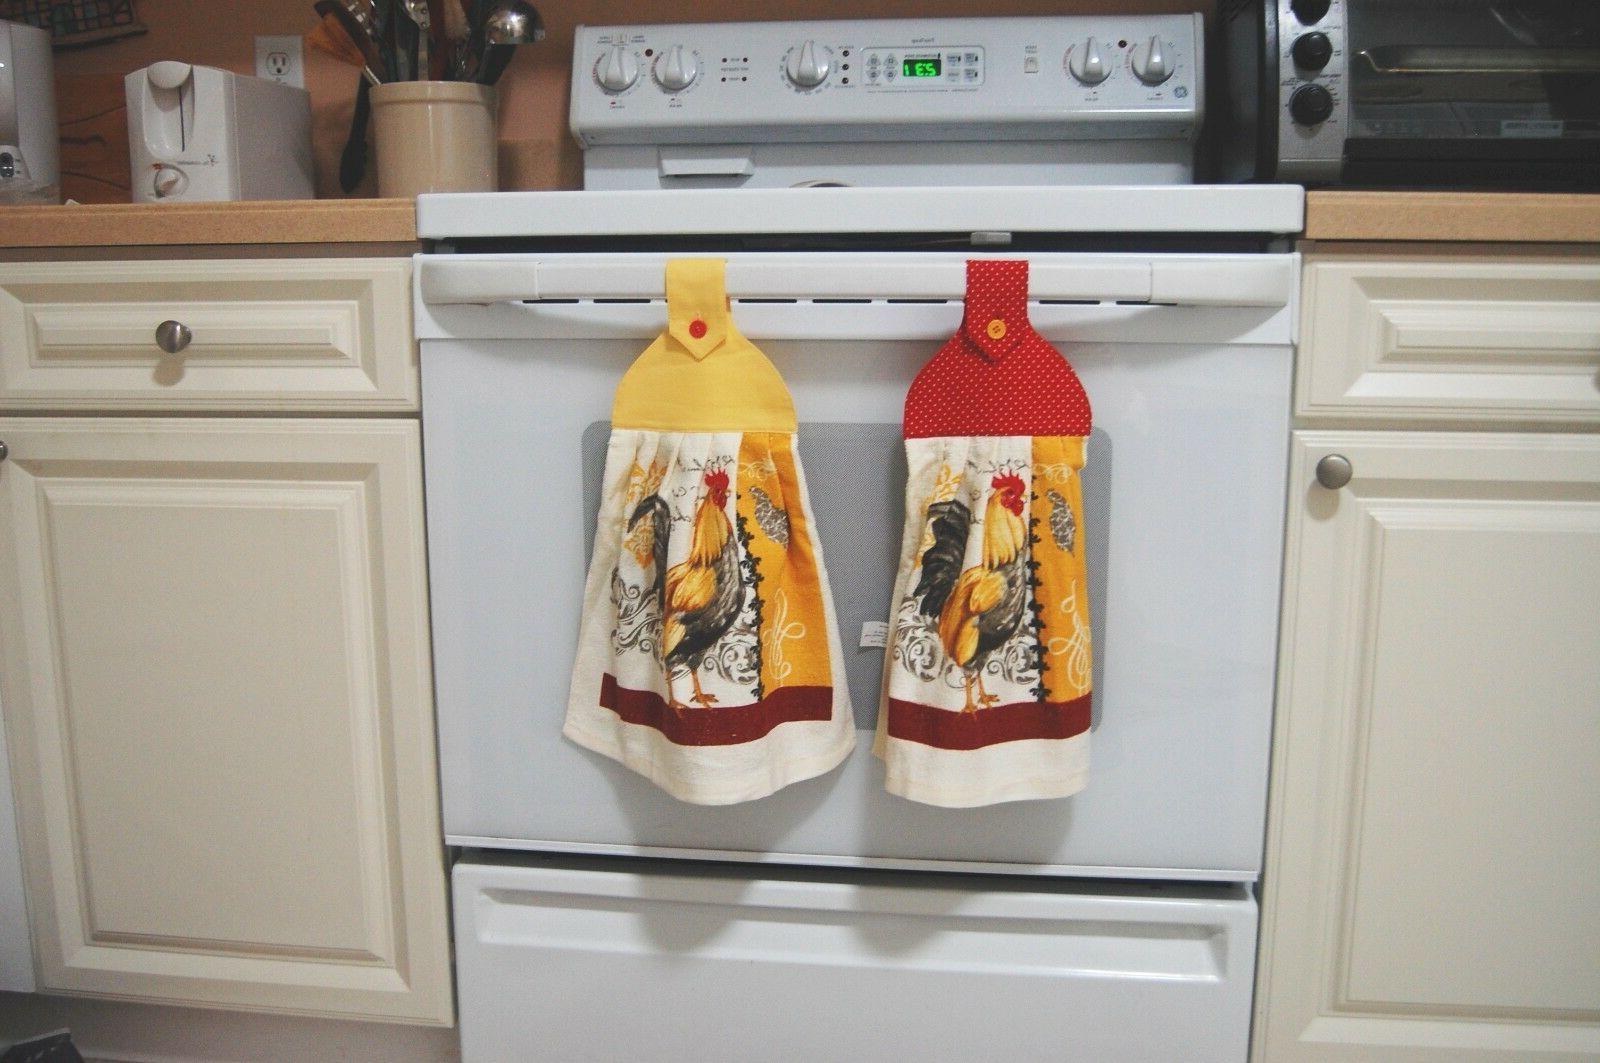 2 royal towel and kitchen towel